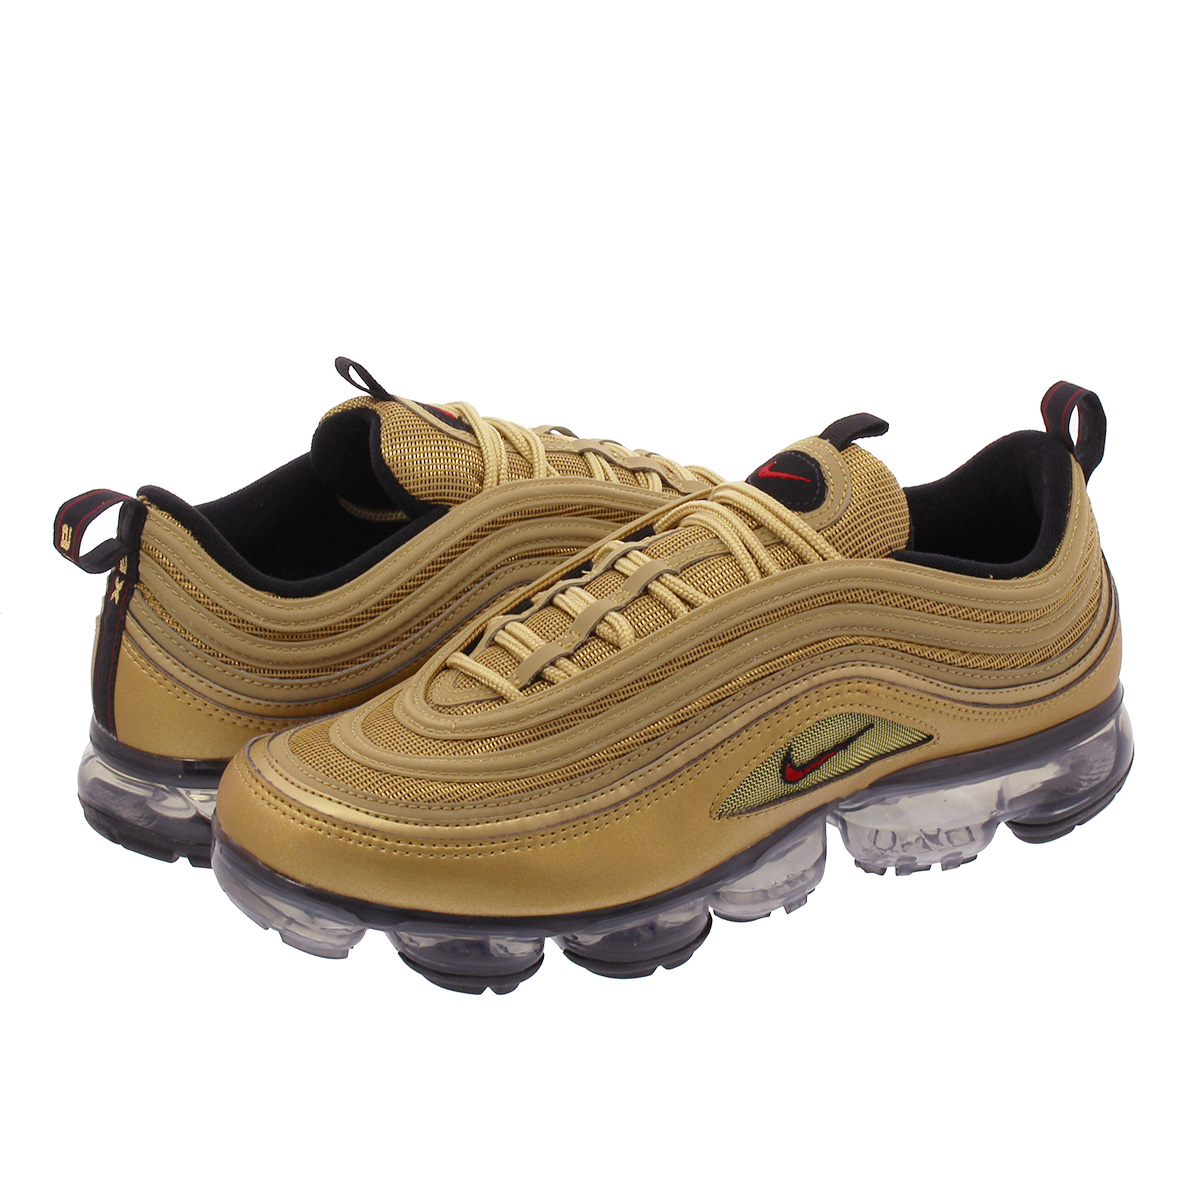 best service 21663 71bf2 NIKE AIR VAPORMAX 97 Nike air vapor max 97 METALLIC GOLD/VARSITY  RED/BLACK/WHITE aj7291-700